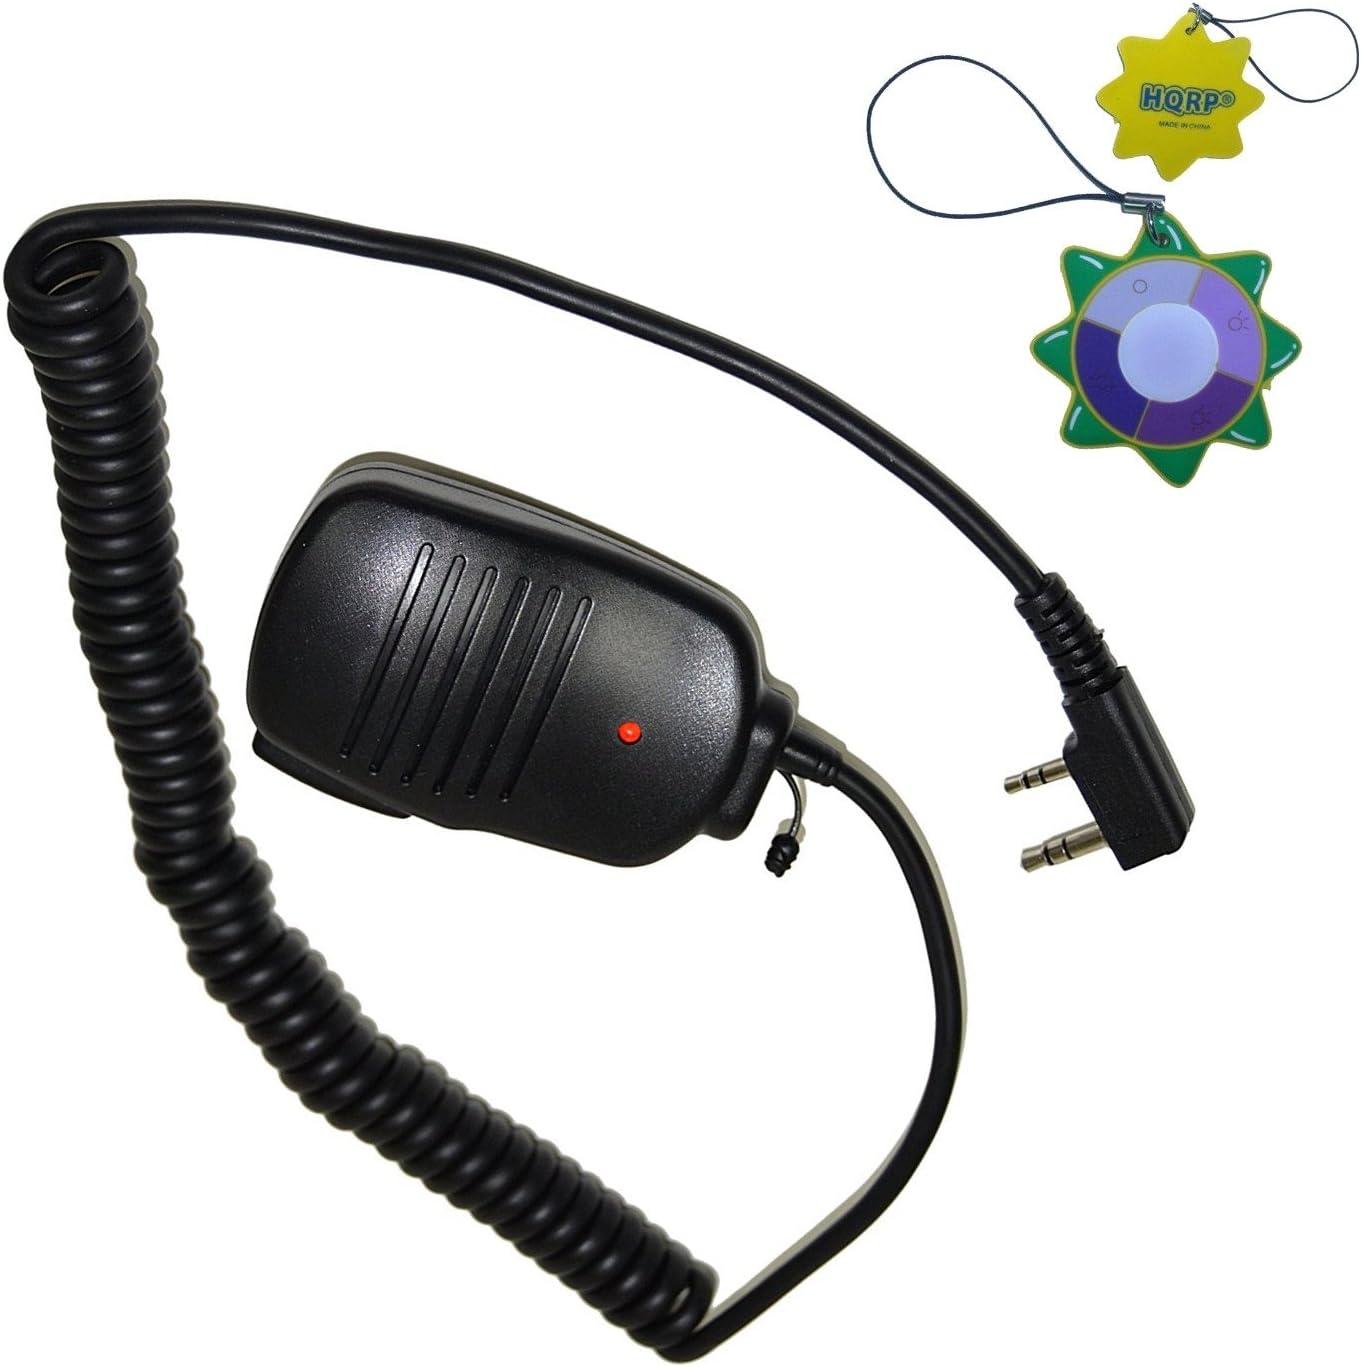 2-Pack HQRP 2 Pinnen Mini Lautsprecher Mikrofon Für Kenwood Th TK Serie Zweiwege